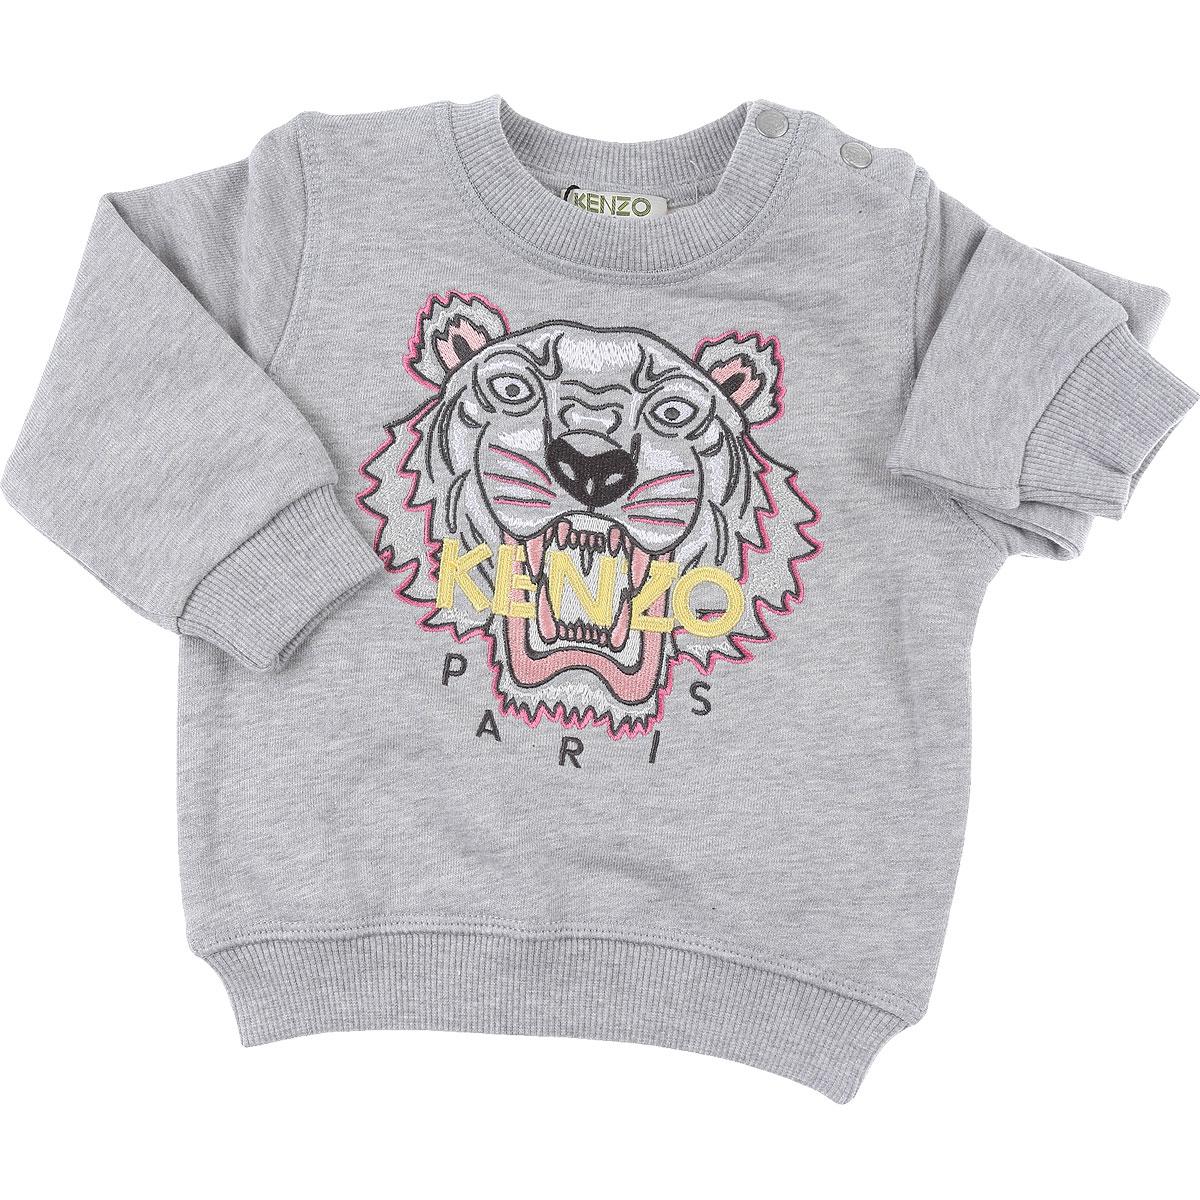 Kenzo Baby Sweatshirts & Hoodies for Girls On Sale, Grey, Cotton, 2019, 12M 18M